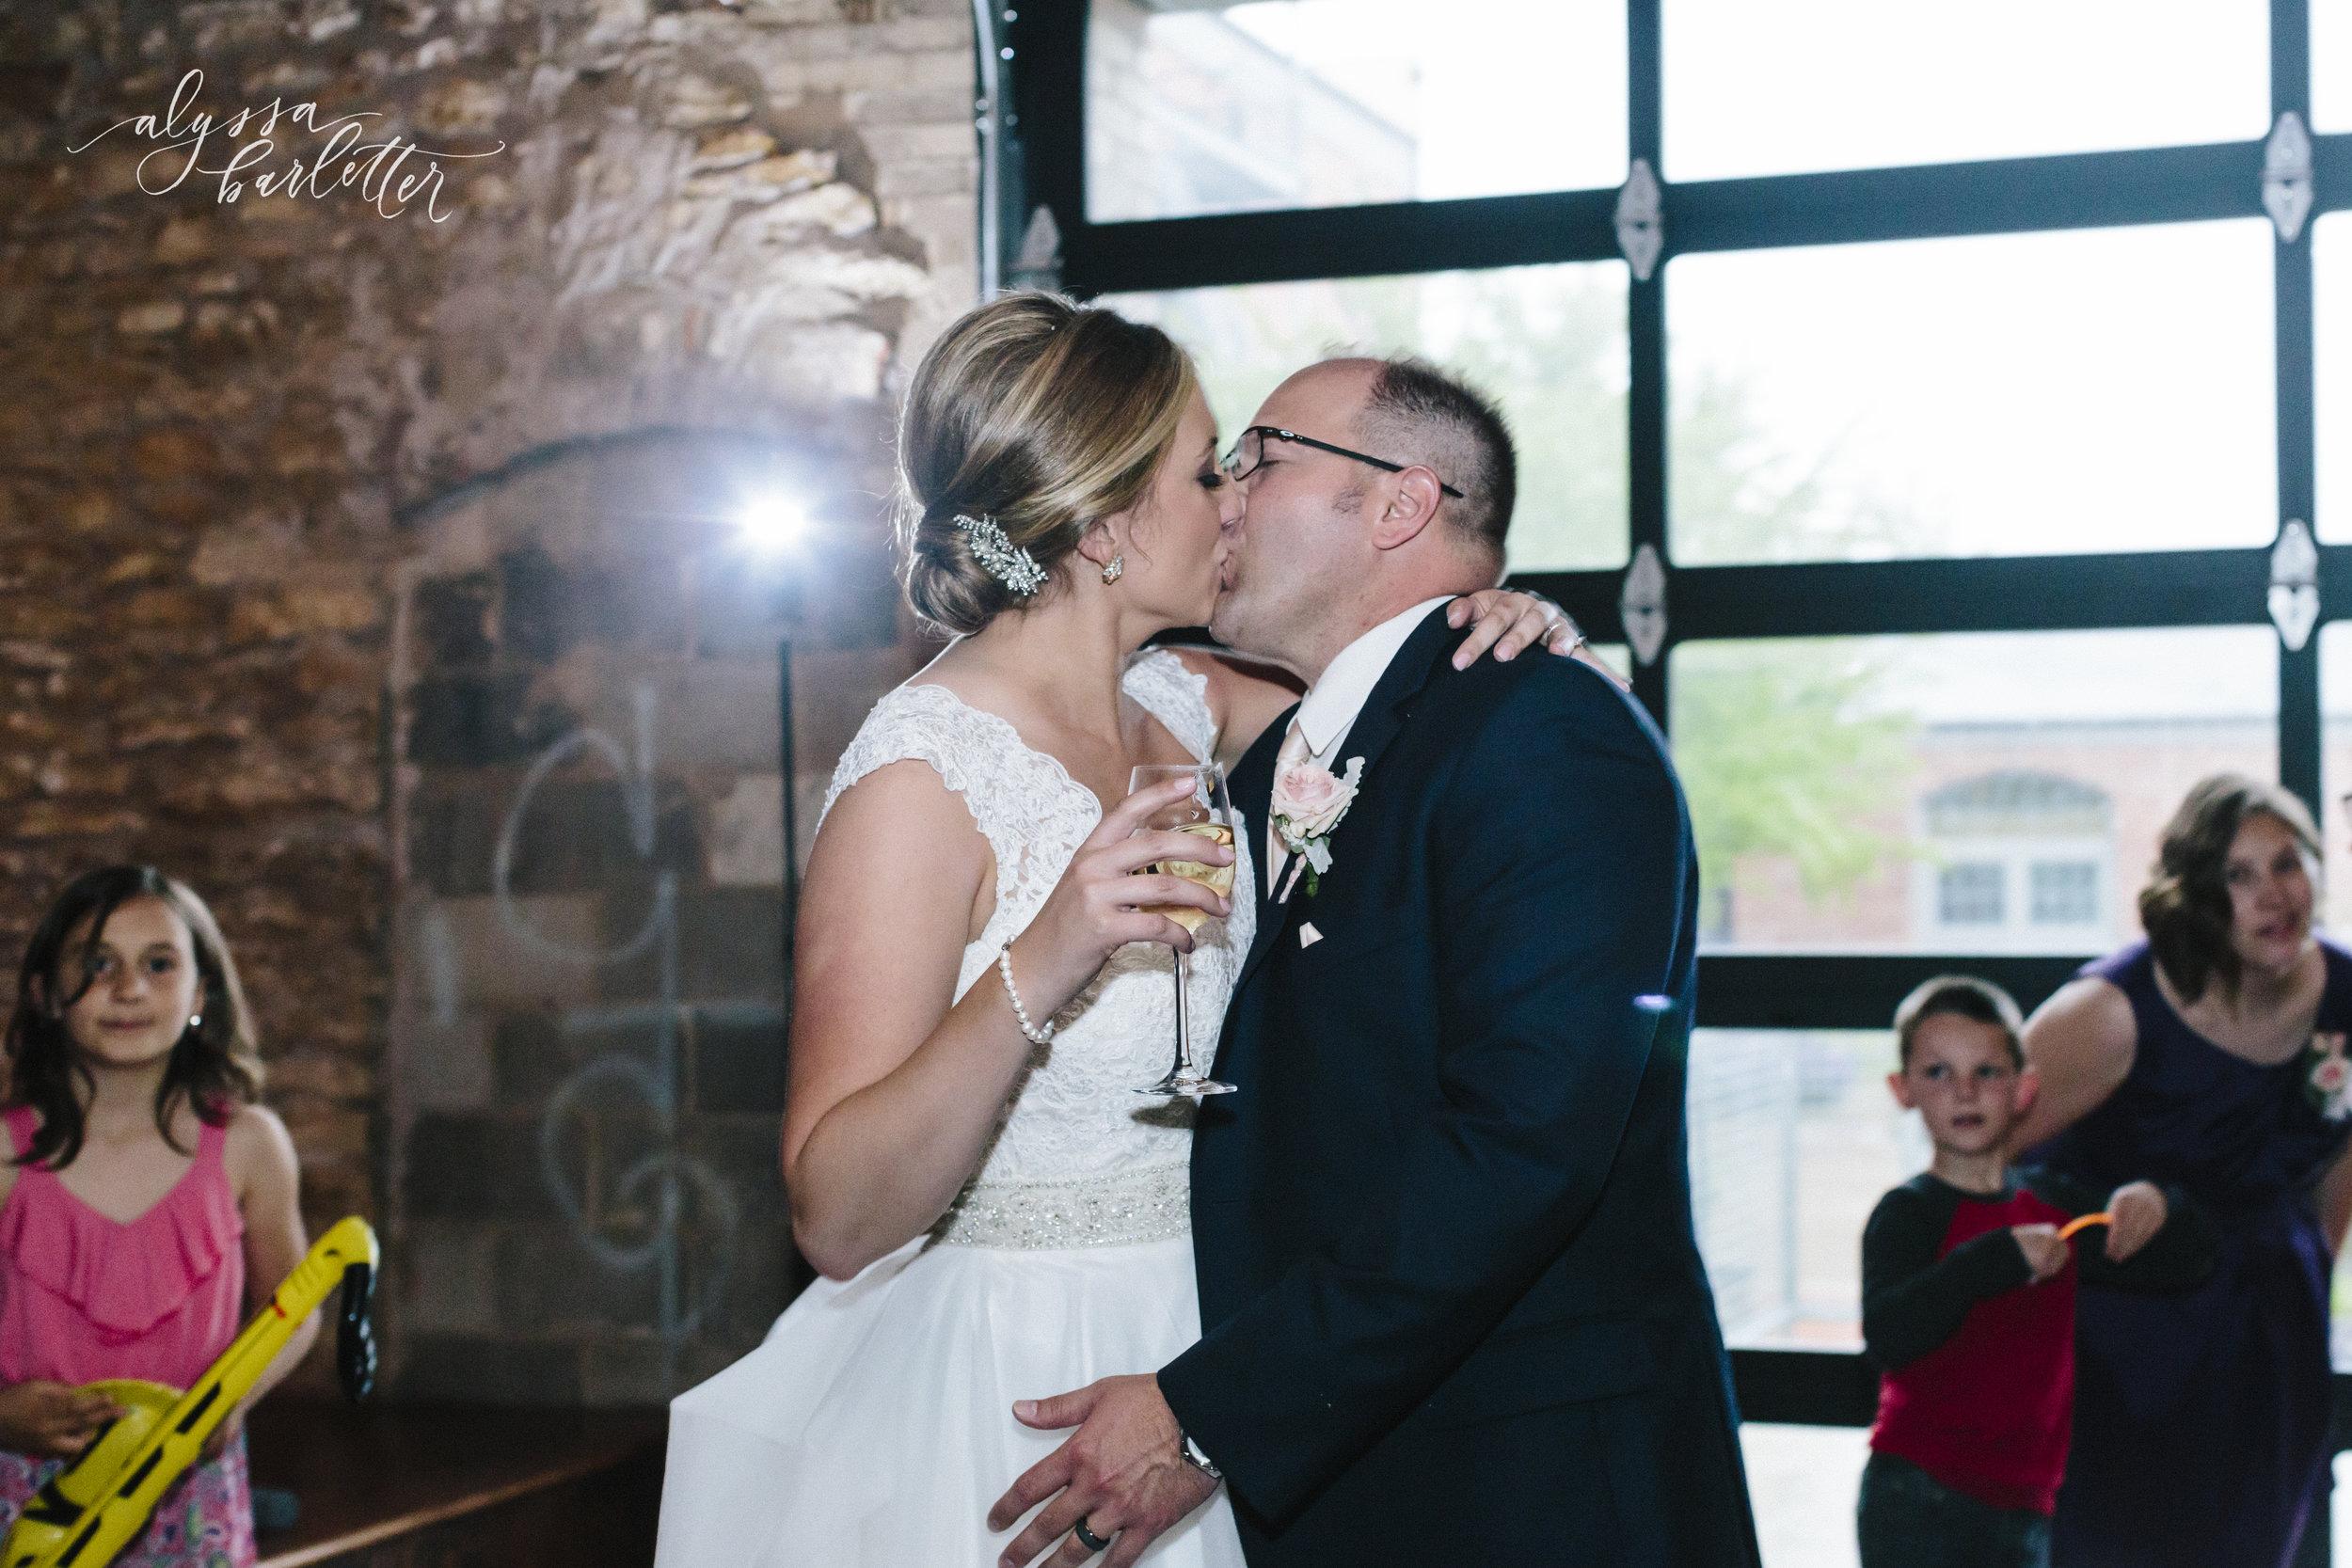 alyssa barletter photography cider gallery lawrence kansas rainy day wedding megan and brett-1-55.jpg